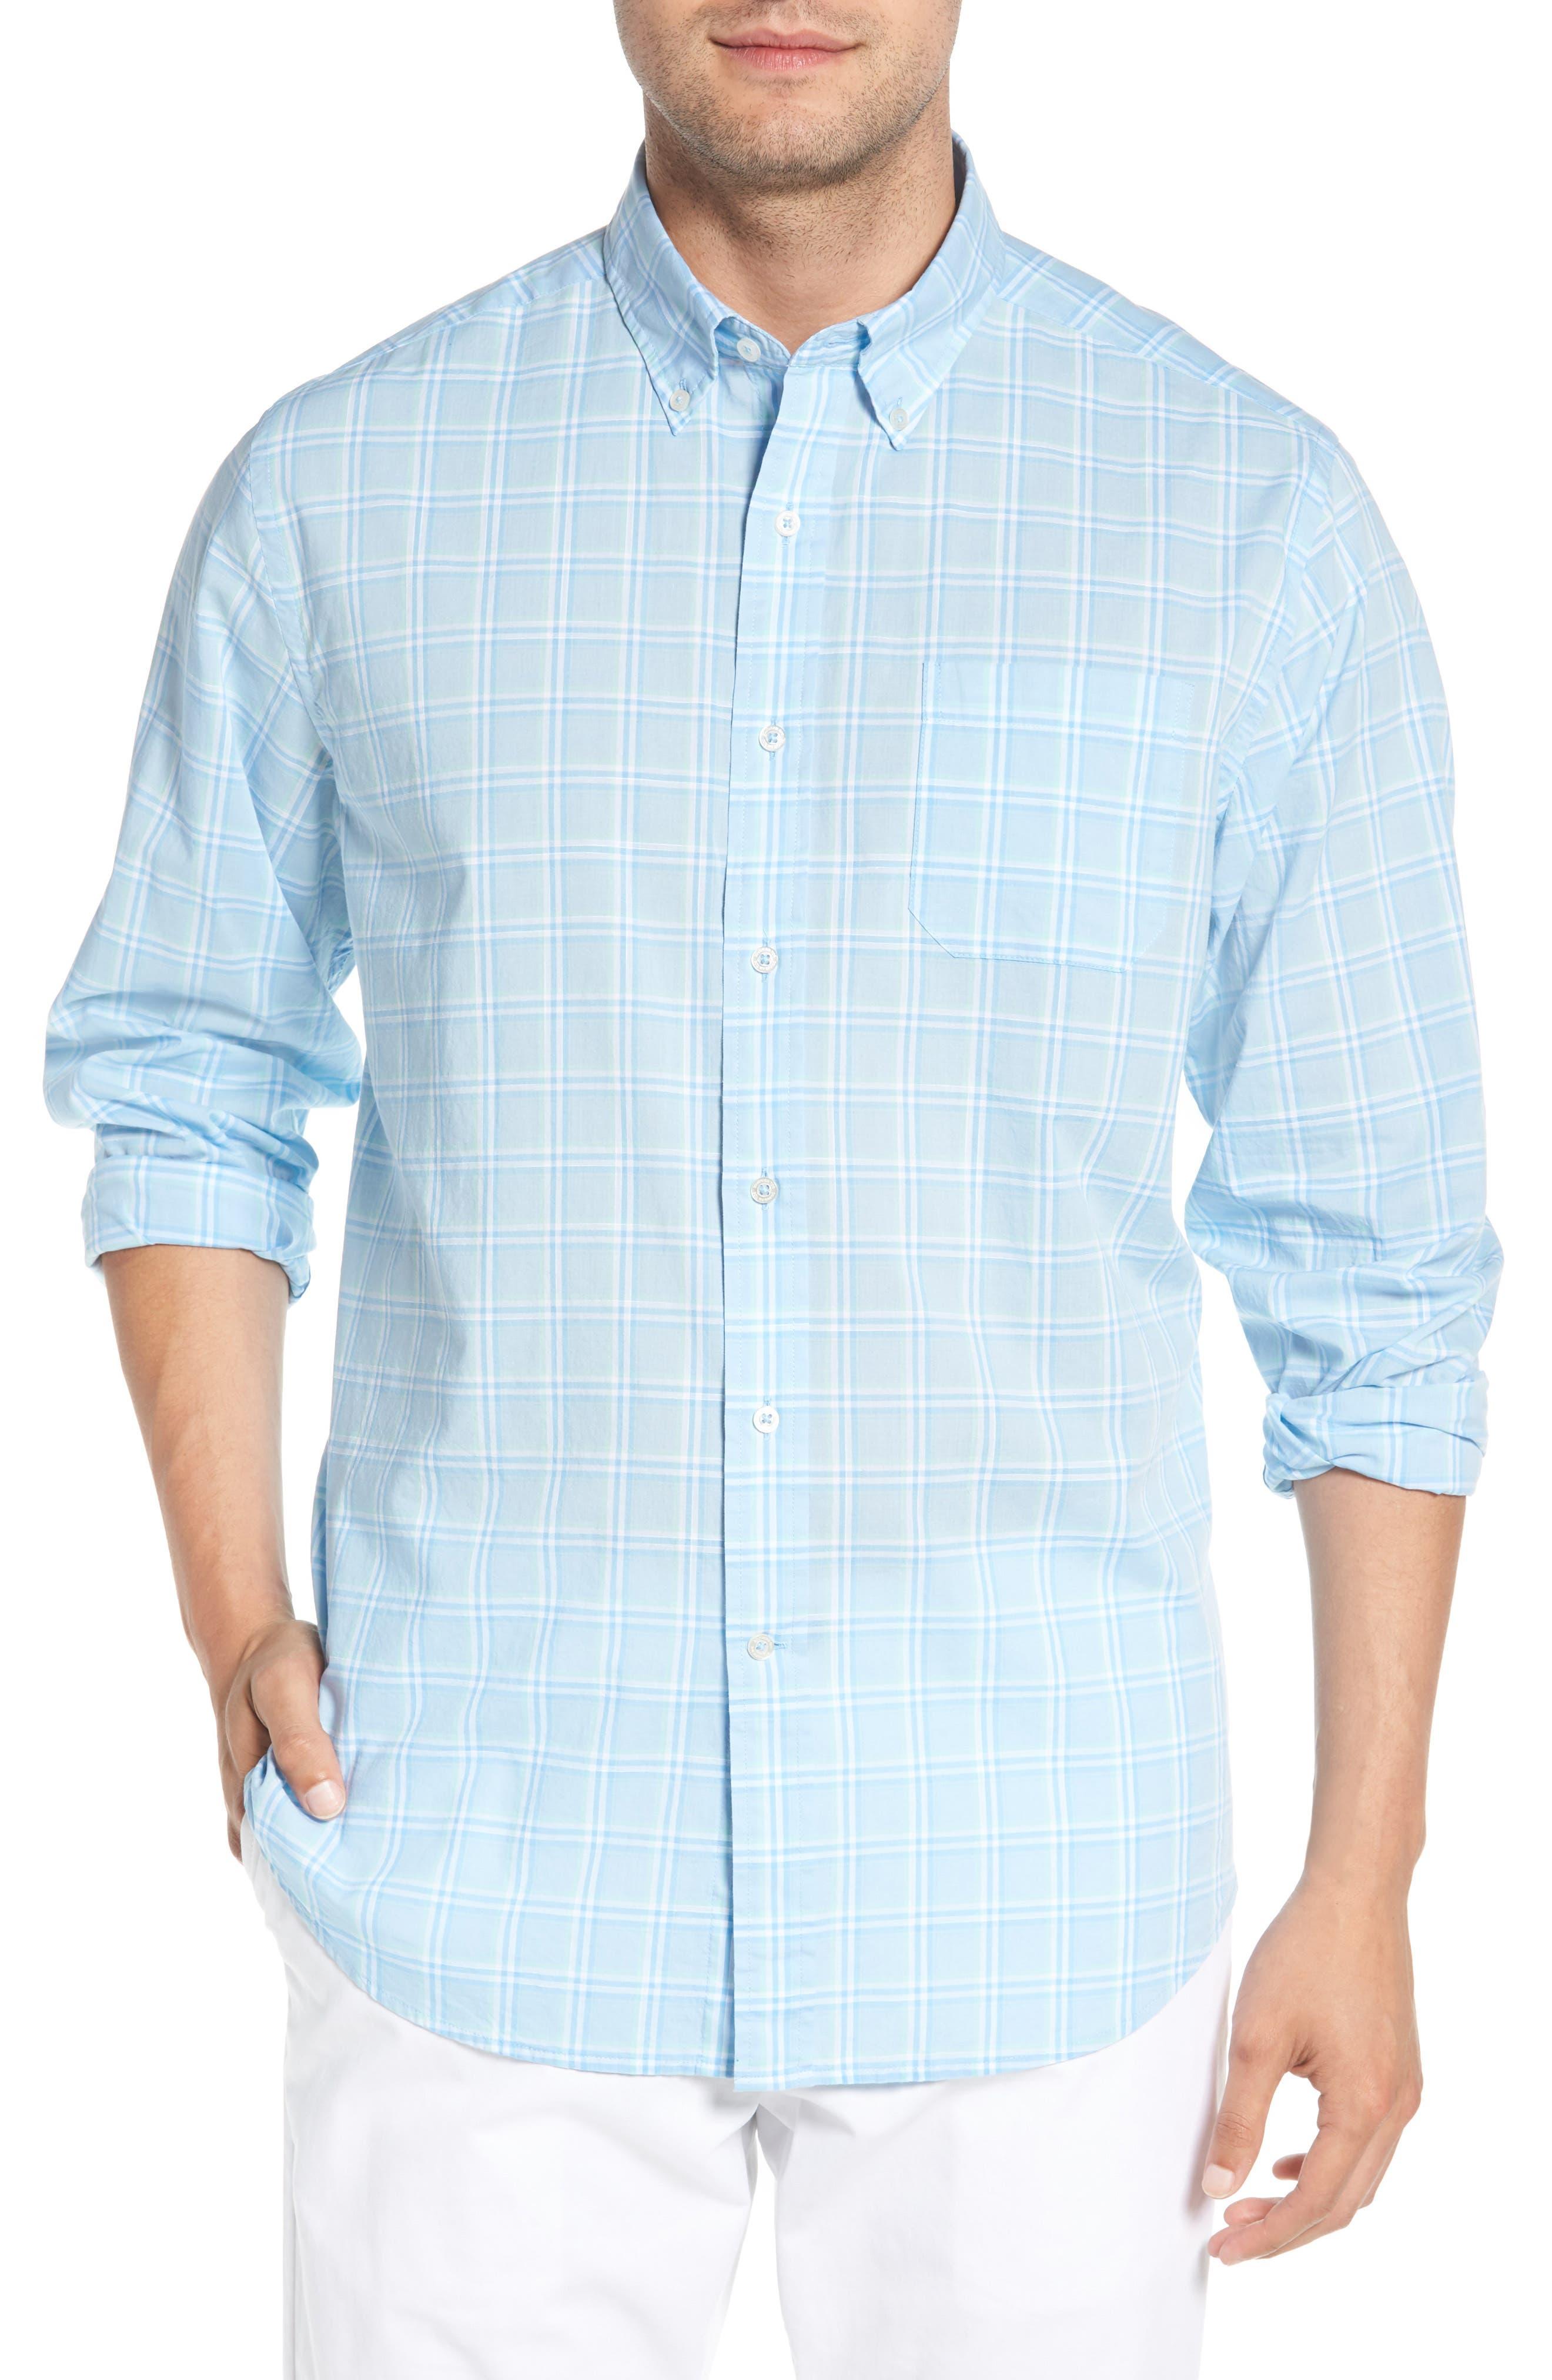 Roadstead Regular Fit Plaid Sport Shirt,                         Main,                         color, 450